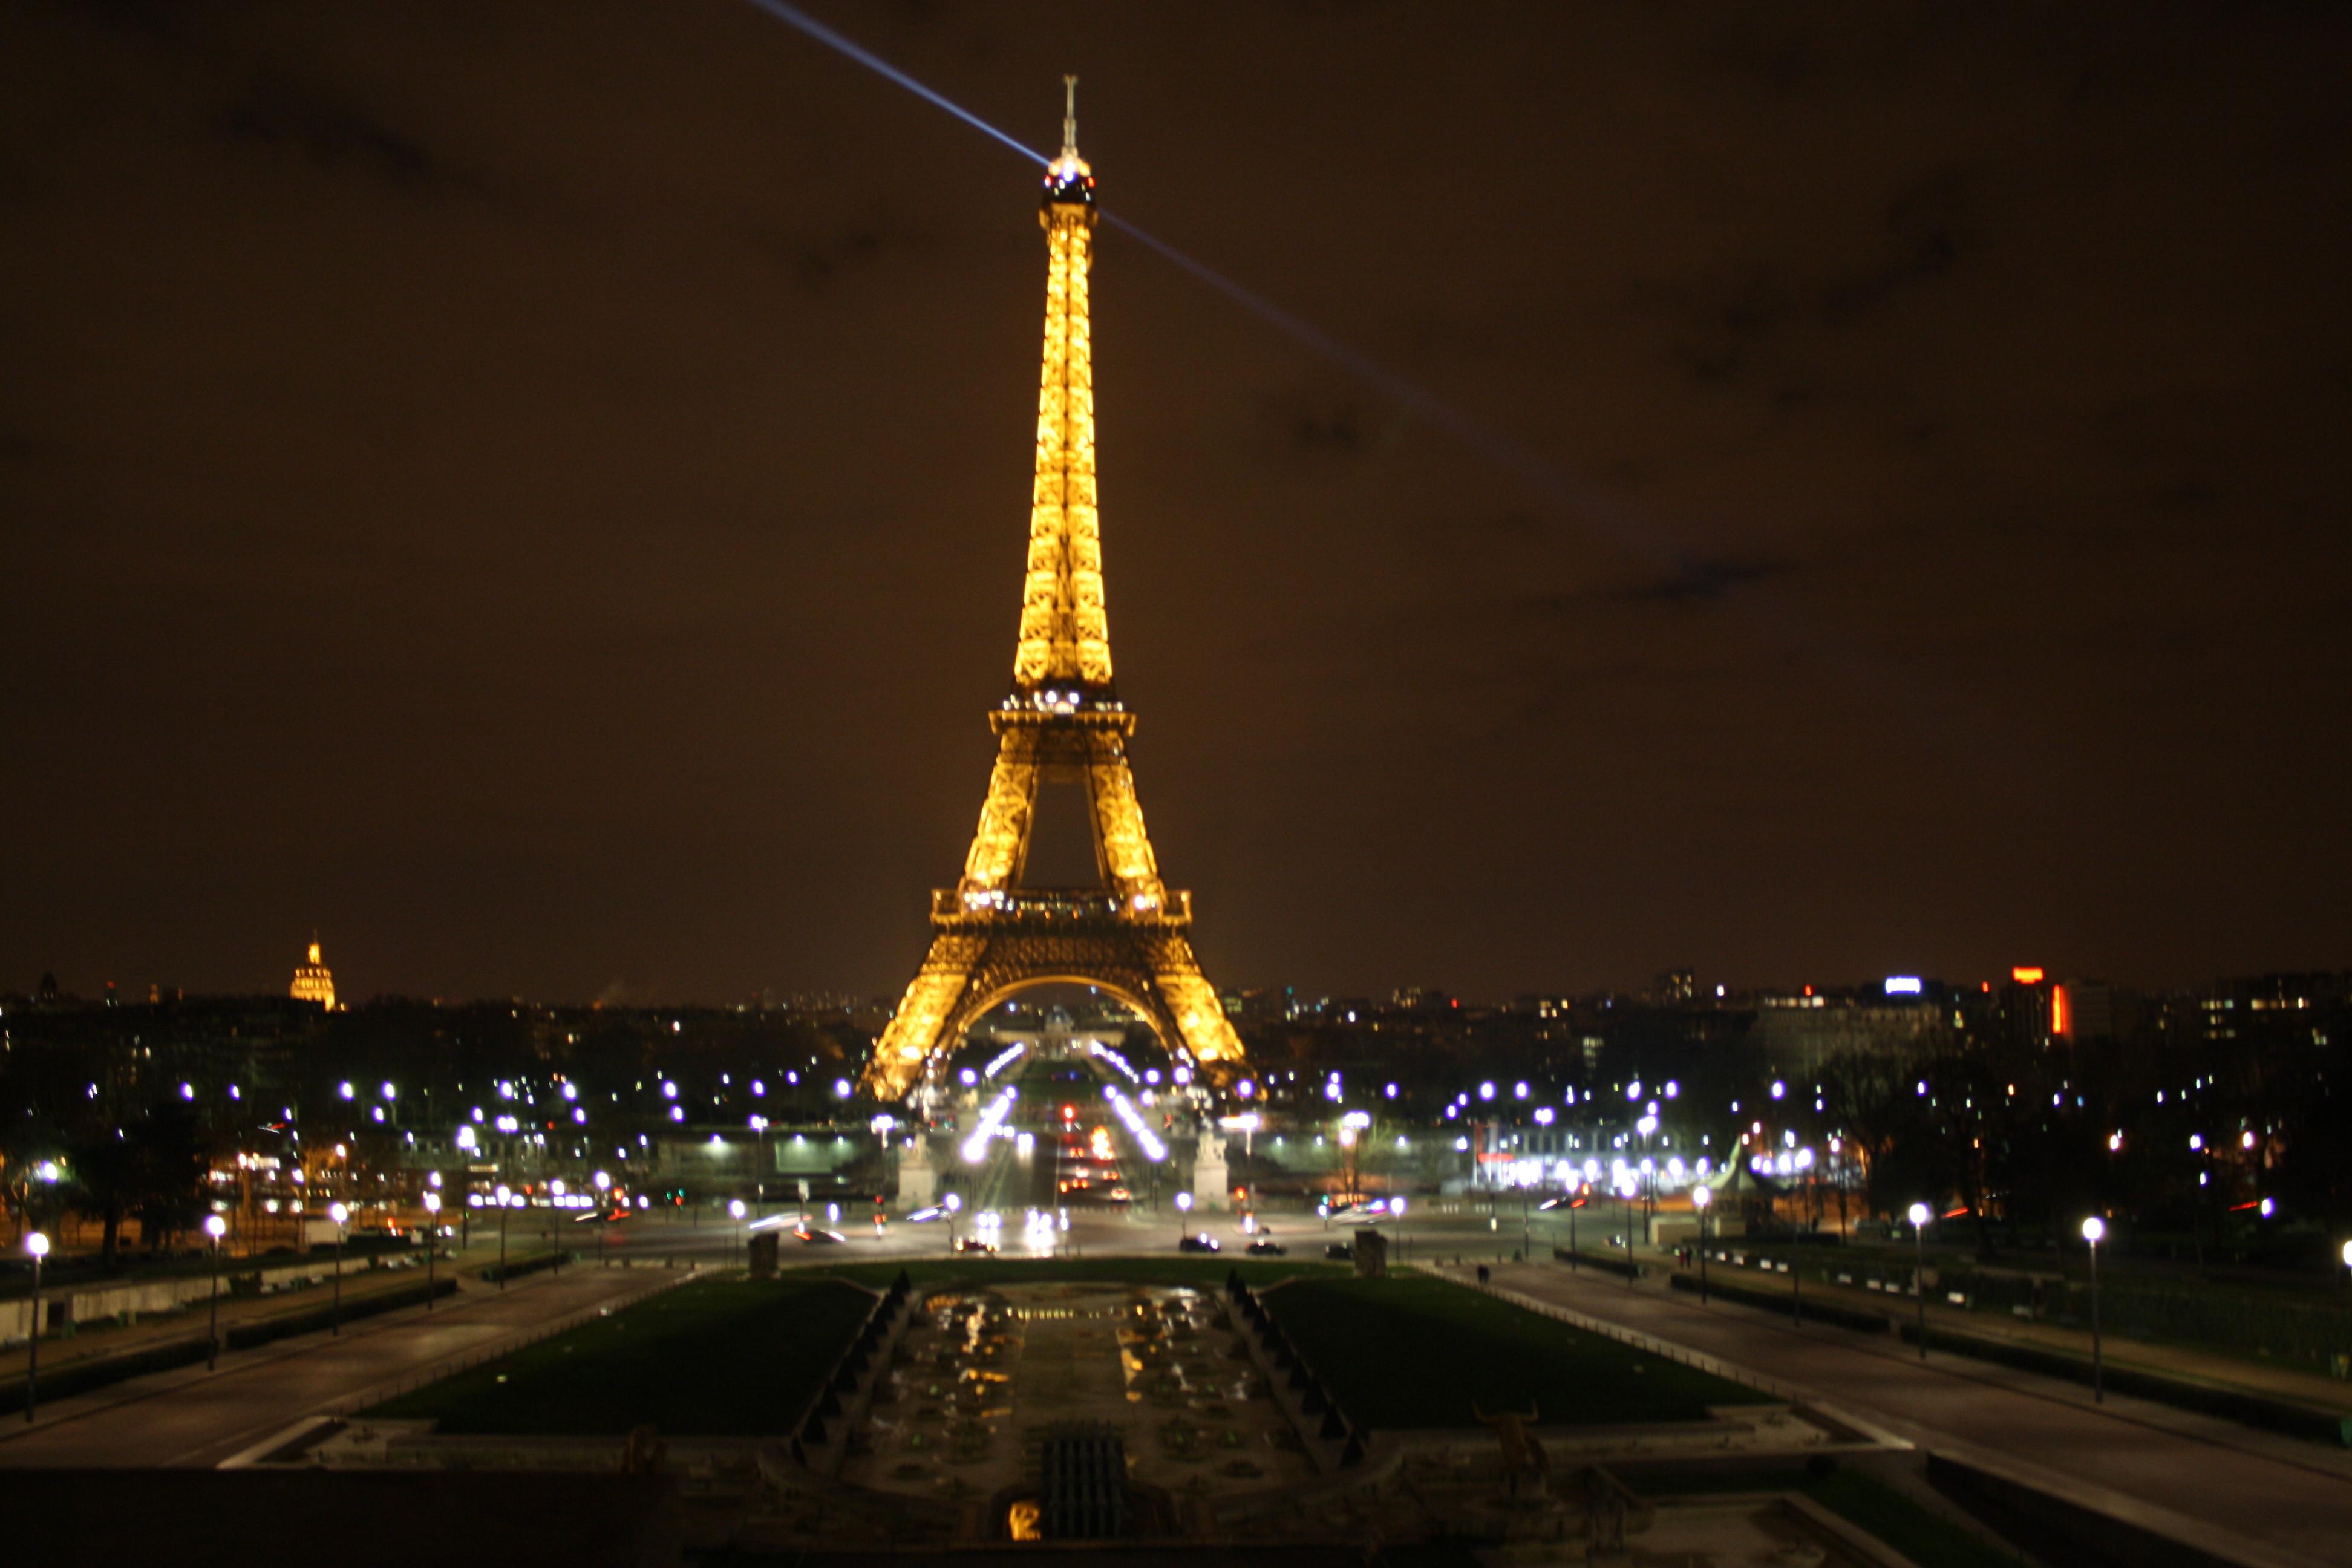 http://fc04.deviantart.net/fs70/f/2011/034/4/9/paris_by_night_by_zoemash-d38p3tl.jpg